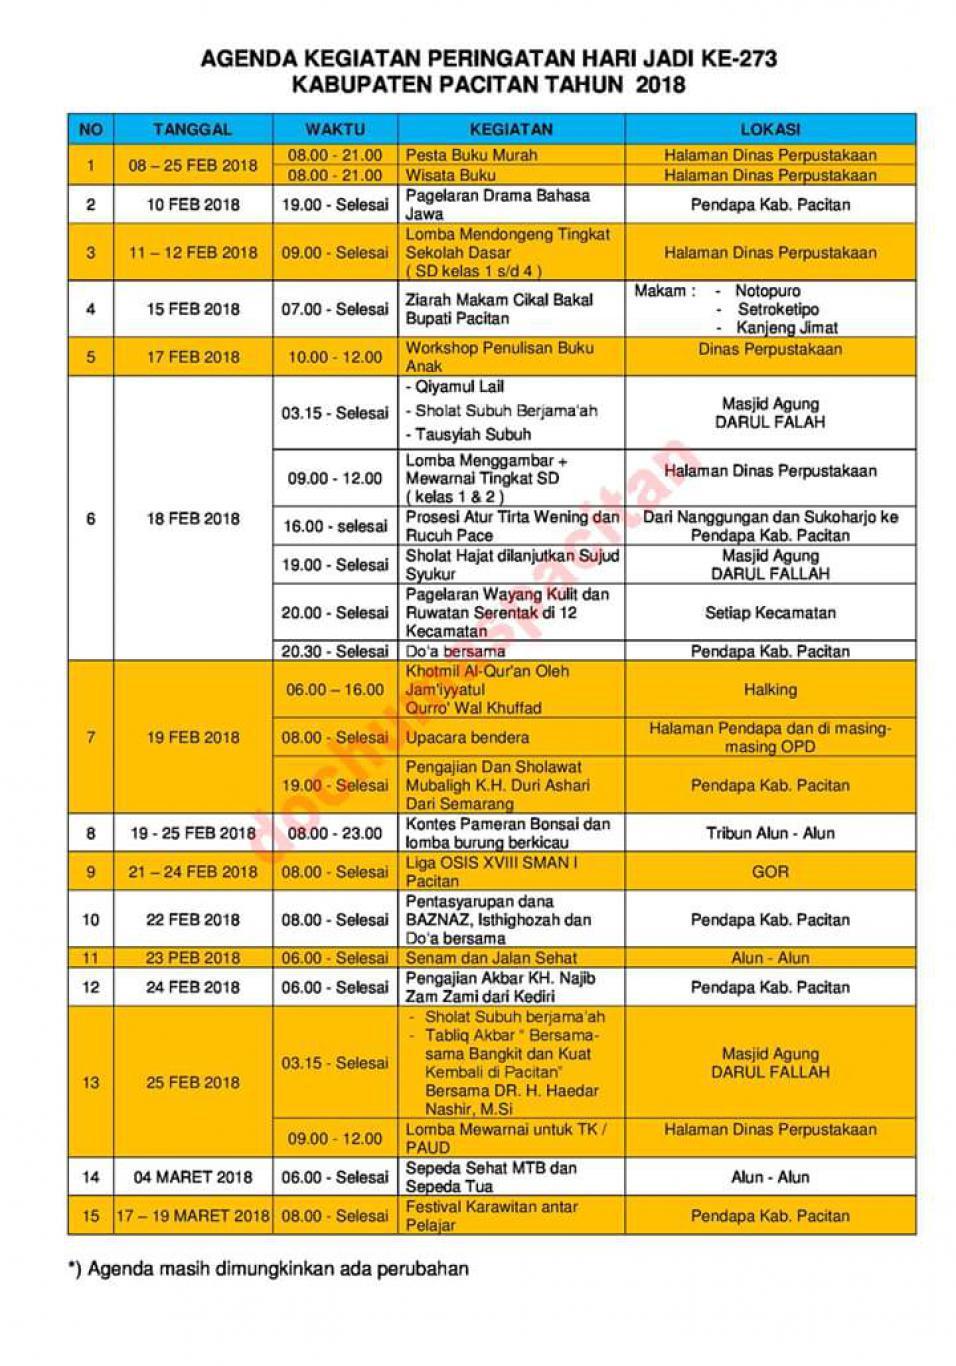 Agenda Kegiatan Peringatan Hari Jadi 273 Kabupaten Pacitan Tema Diambil